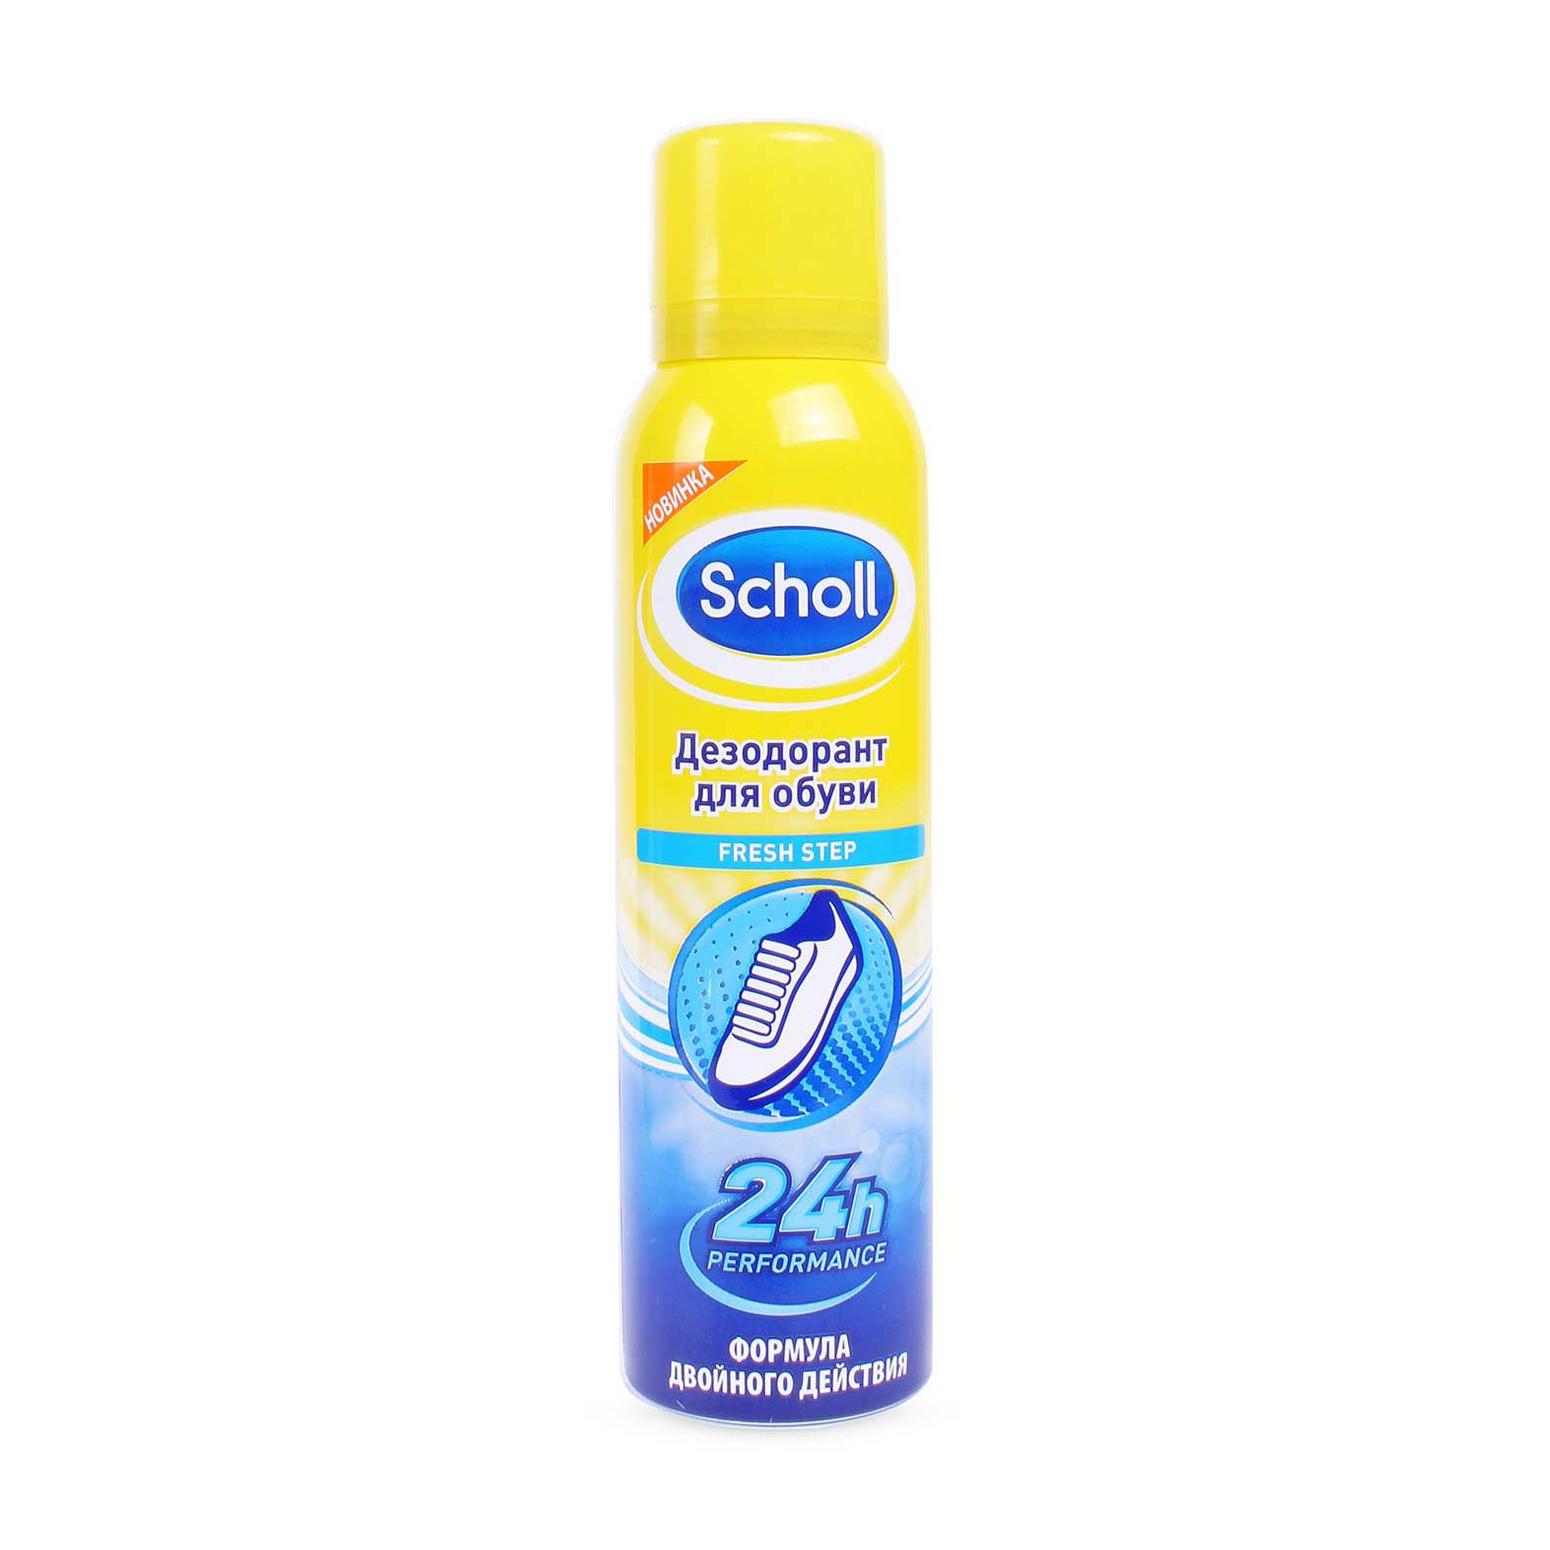 Дезодорант для обуви Scholl, 150мл